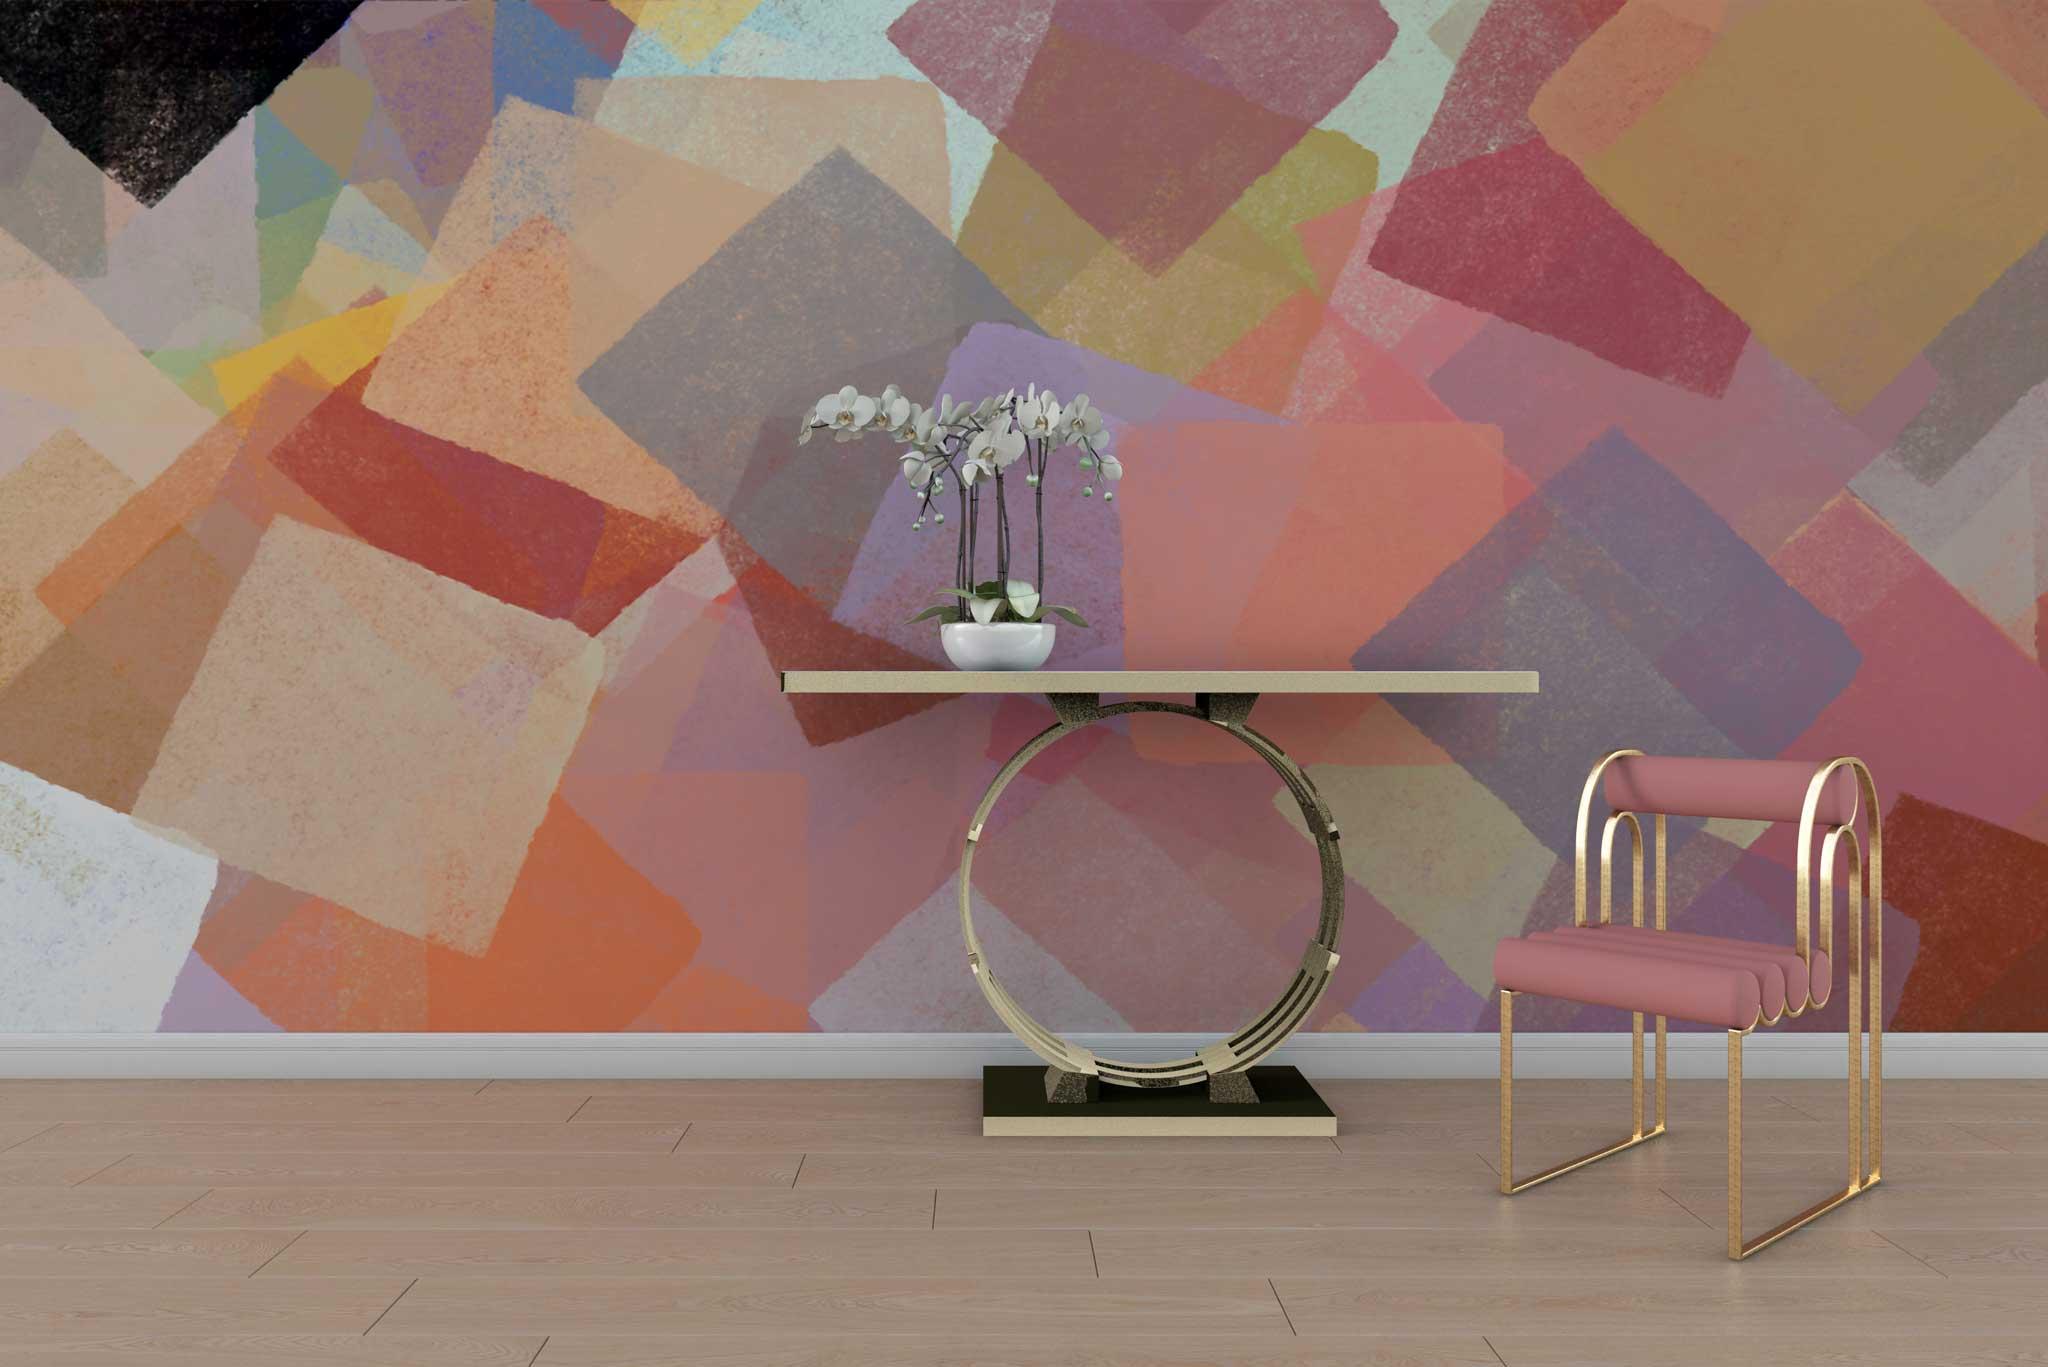 https://daringprints.ro/wp-content/uploads/2020/12/tapet-fototapet-design-interior-personalizat-comanda-special-bucuresti-motiv-geometric-grafic-multicolor-colorat-patrate-1.jpg